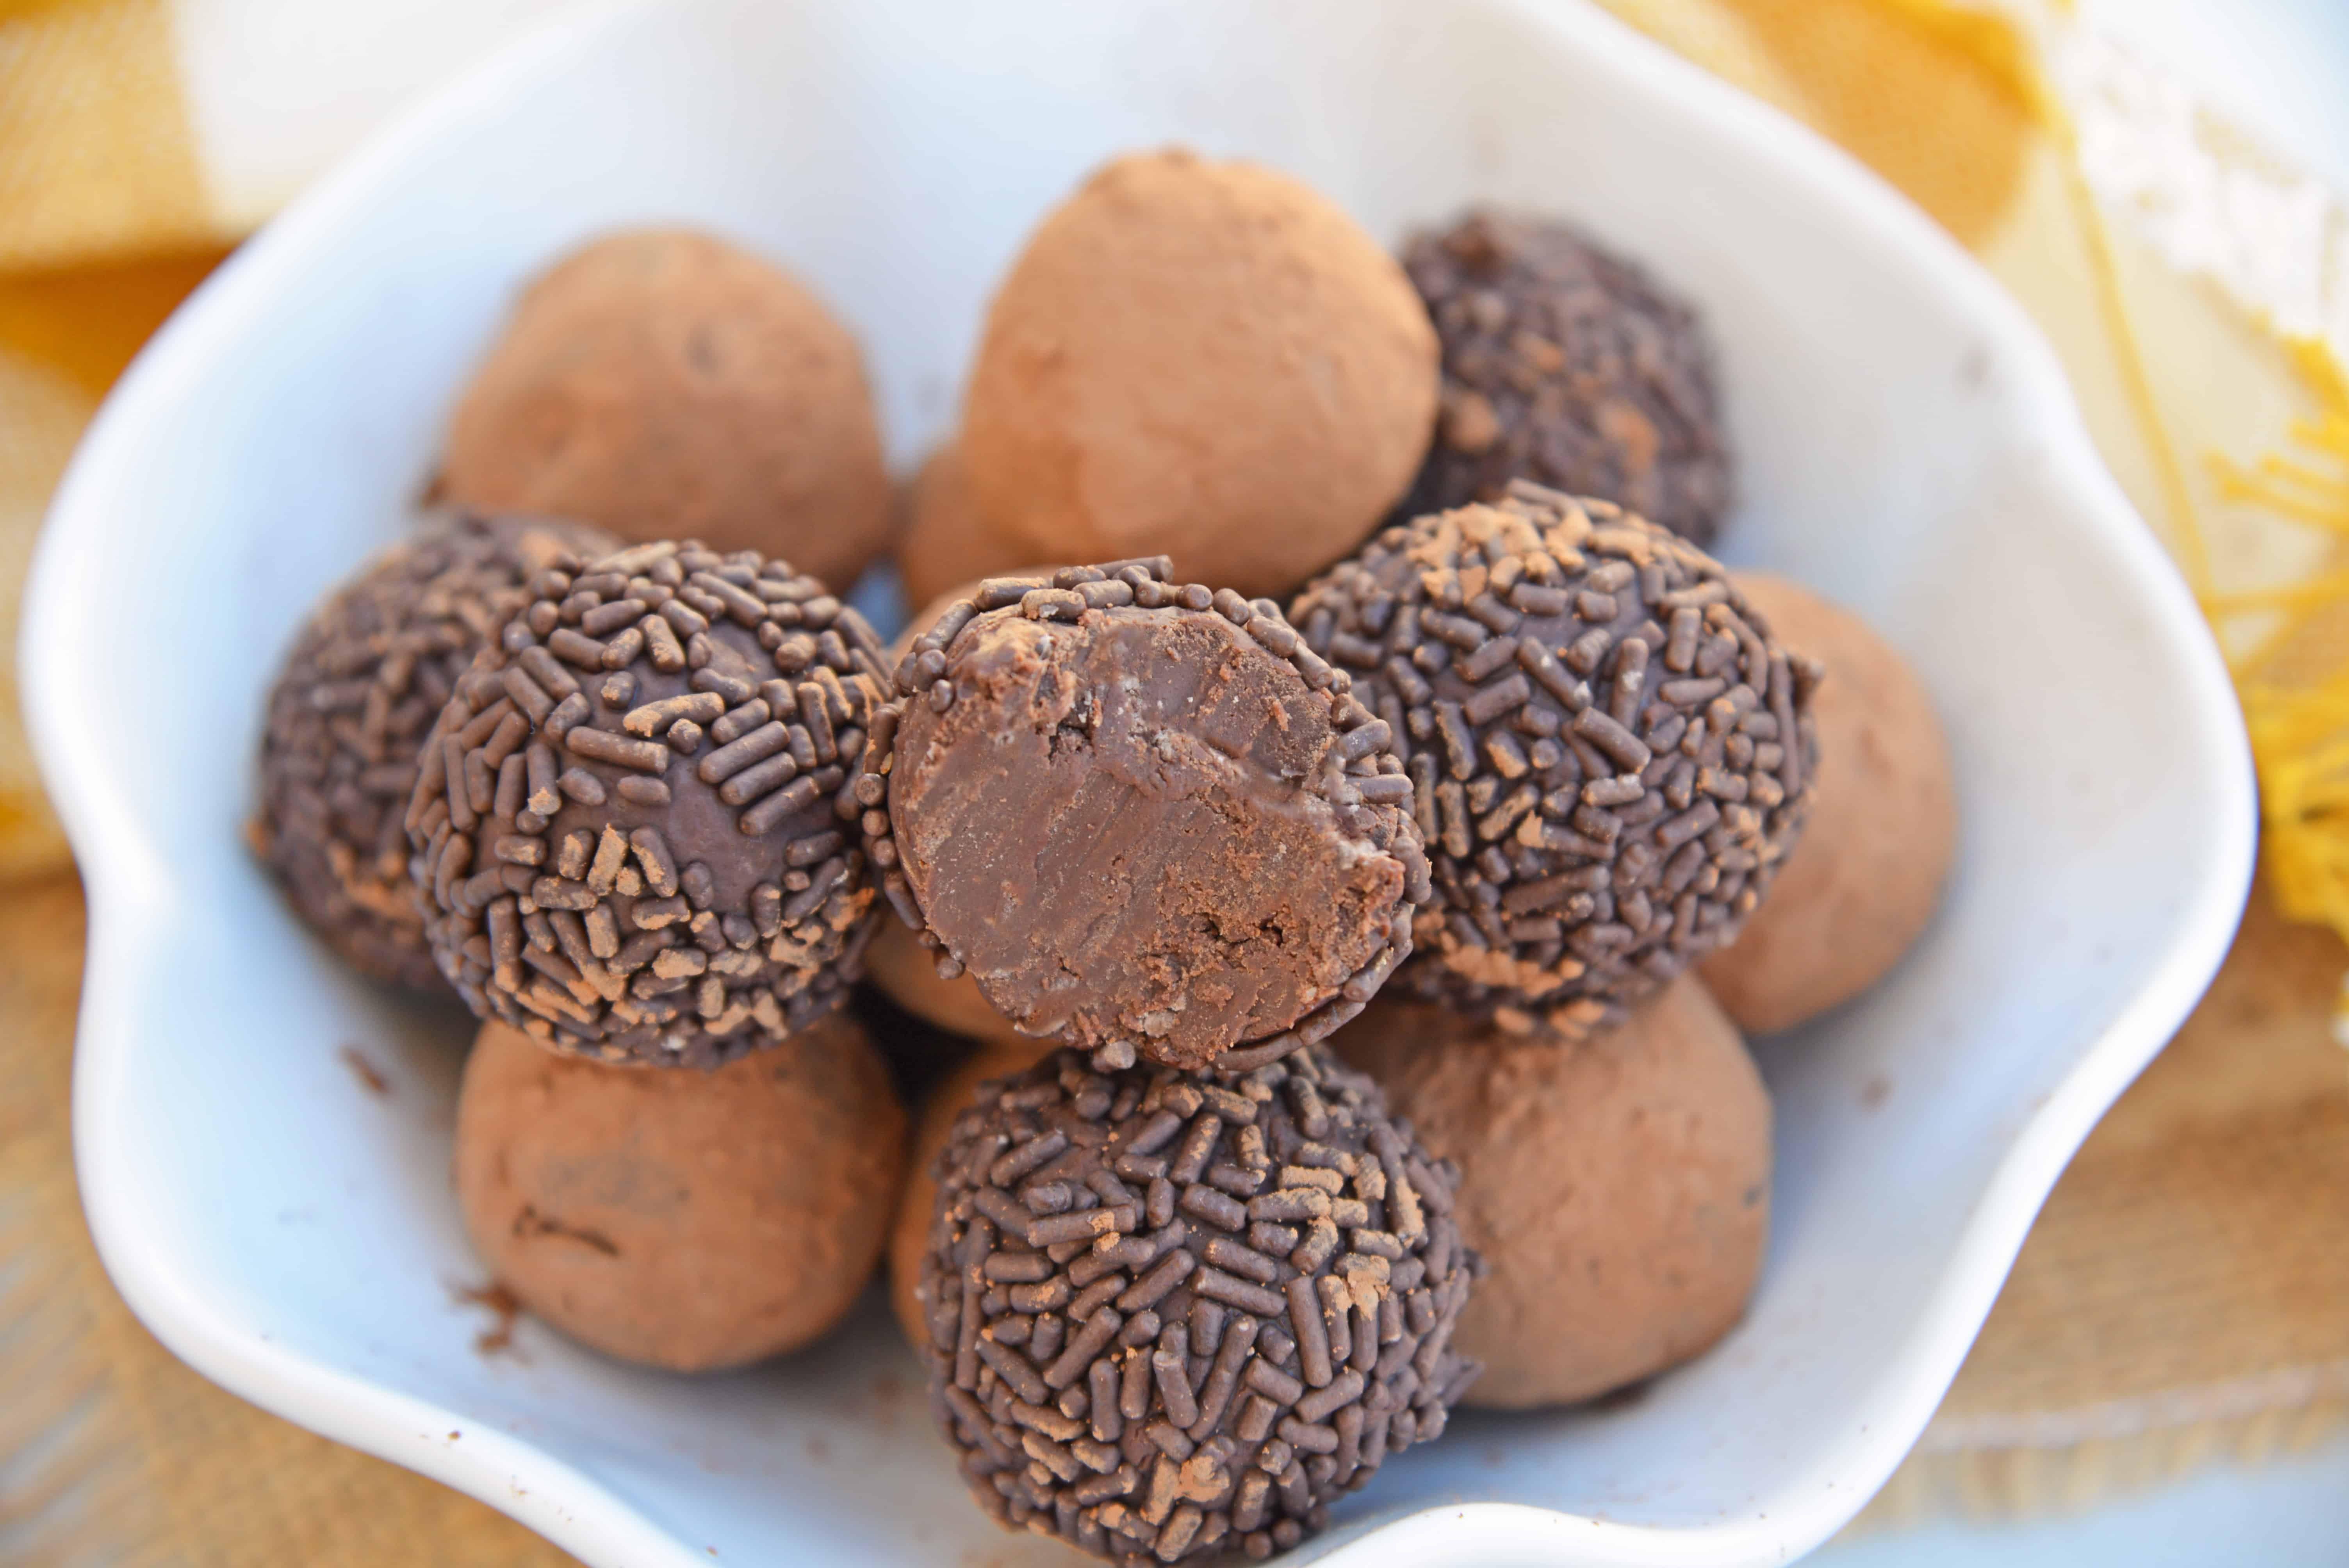 Easy Chocolate Truffles Truffles Using Condensed Milk Easy Chocolate Truffl Chocolate Truffles Easy Chocolate Truffles Packaging Chocolate Truffles